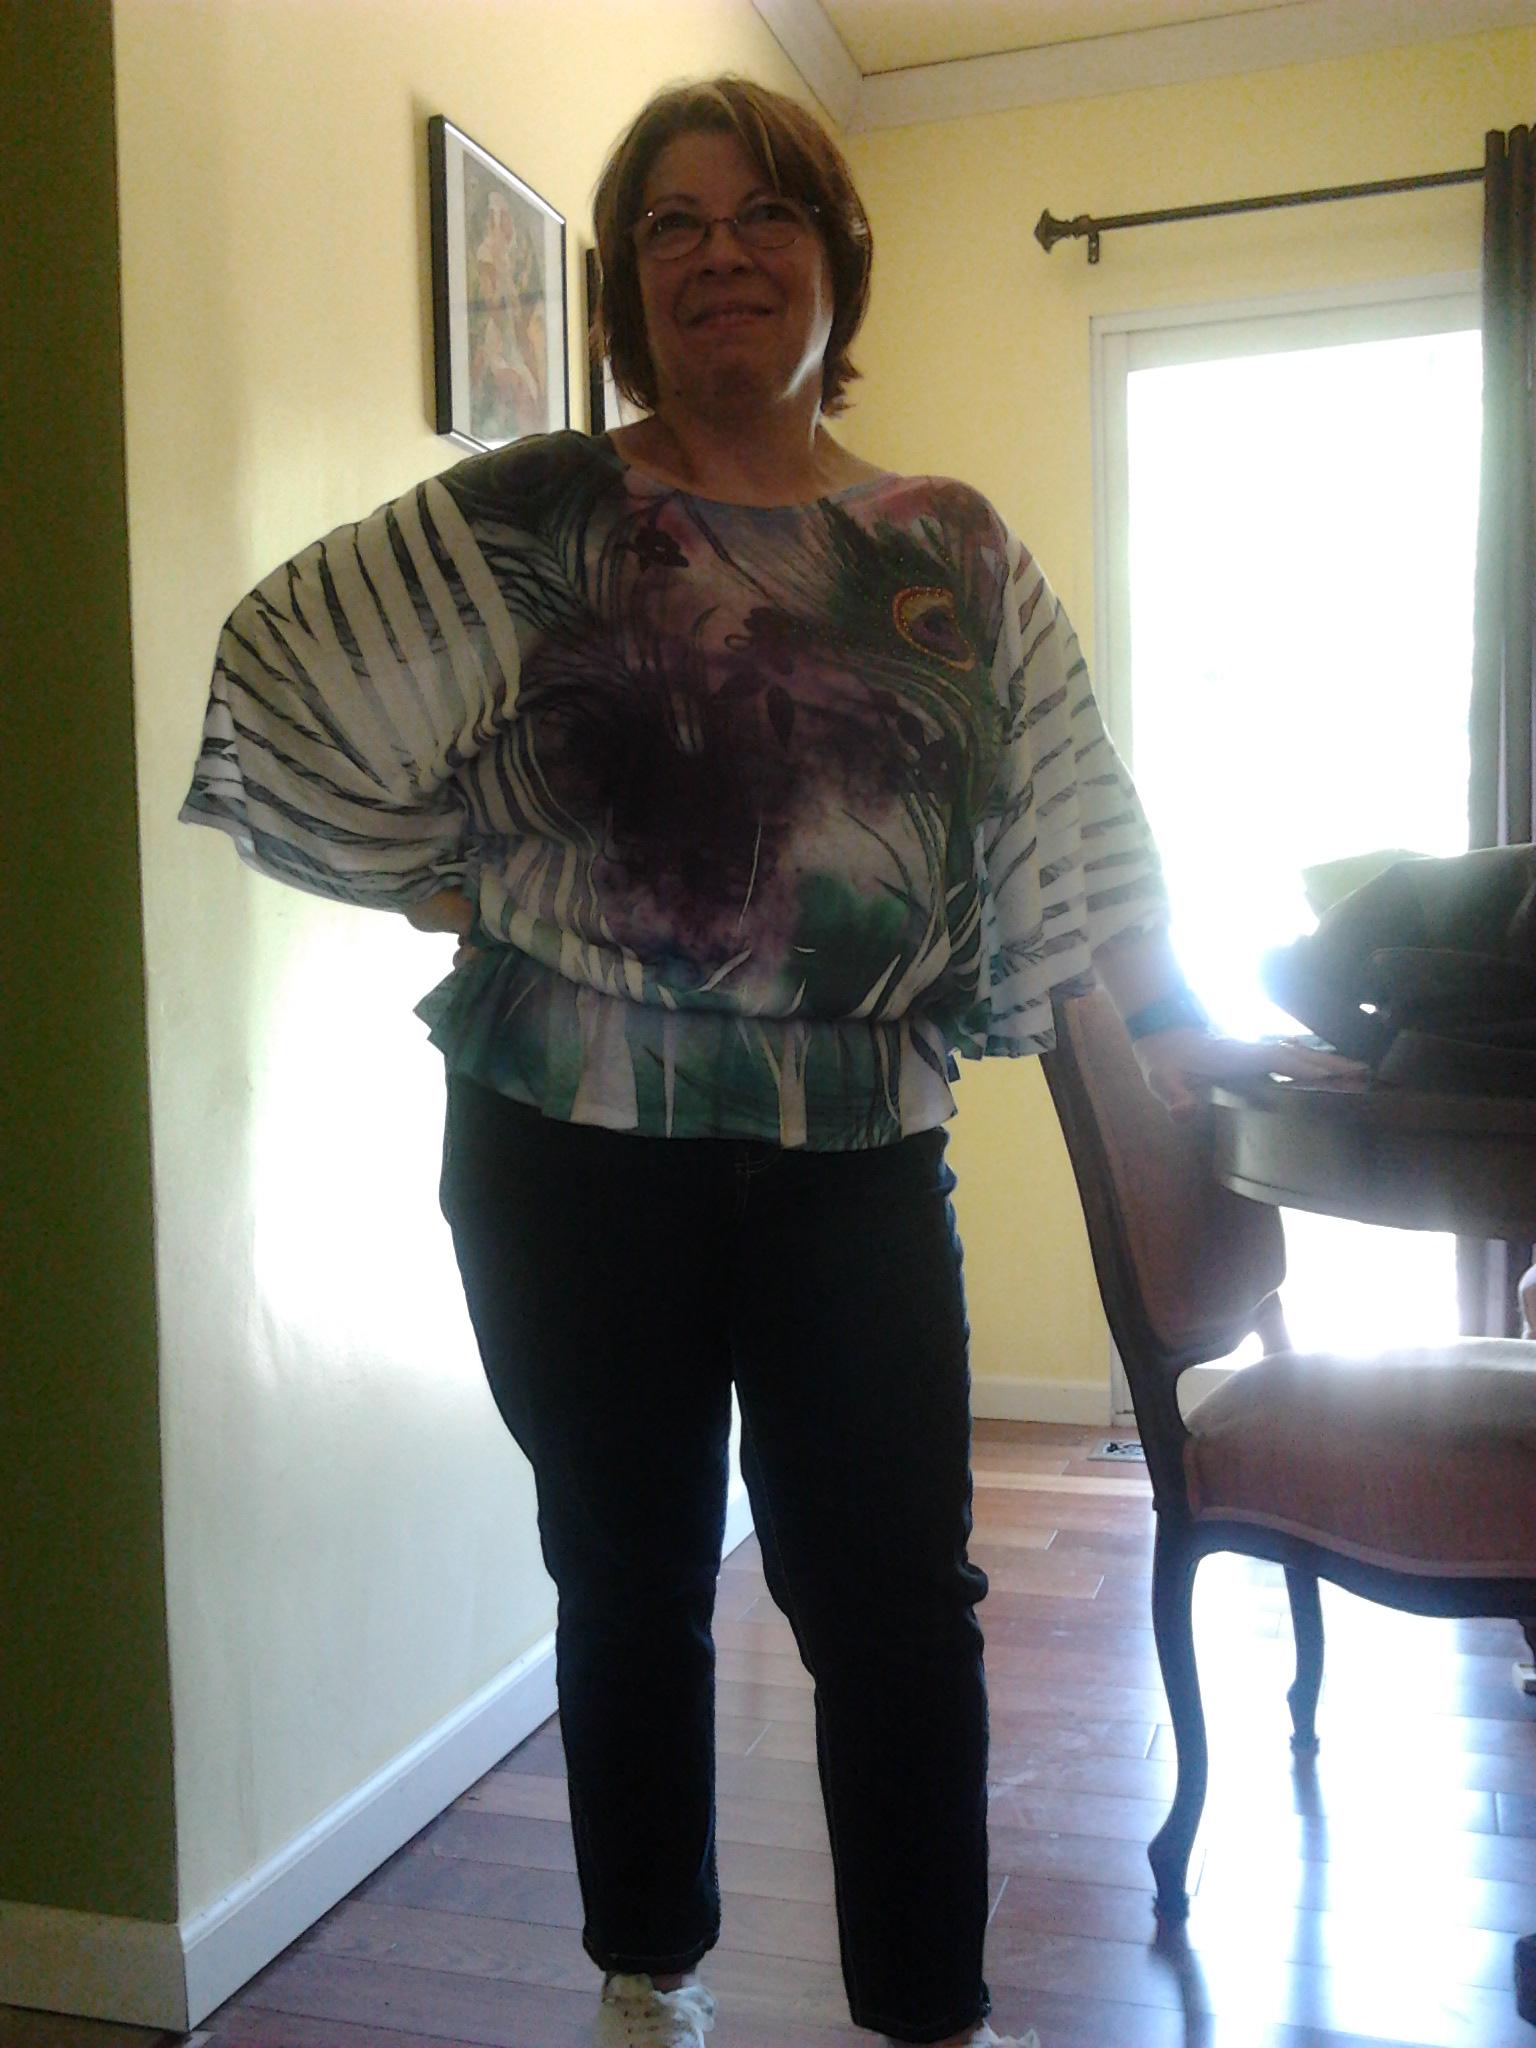 If this shirt was any bigger I'd take flight.